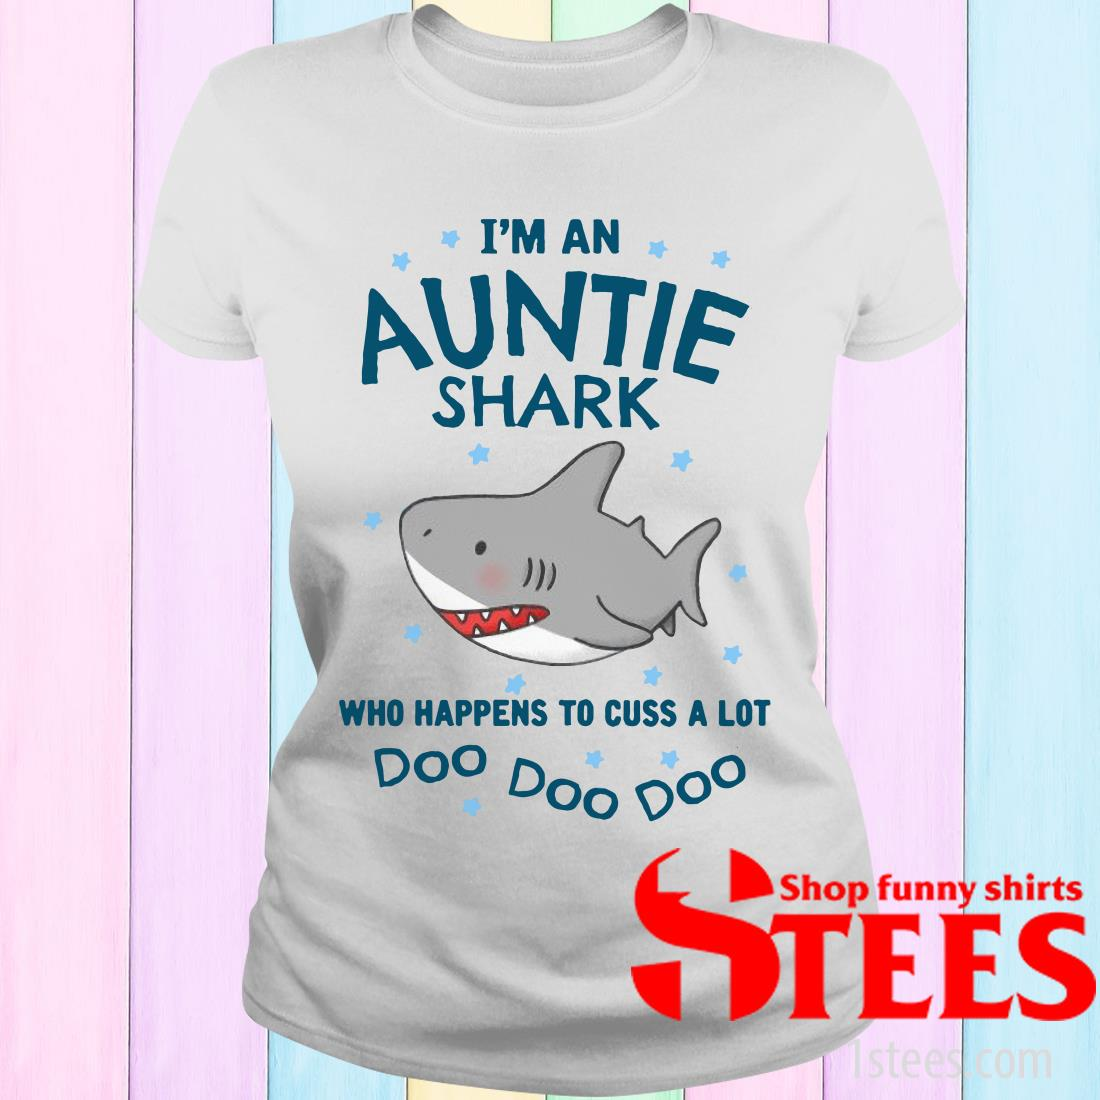 I'm An Auntie Shark Who Happens To Cuss A Lot Doo Doo Doo Women's T-Shirt